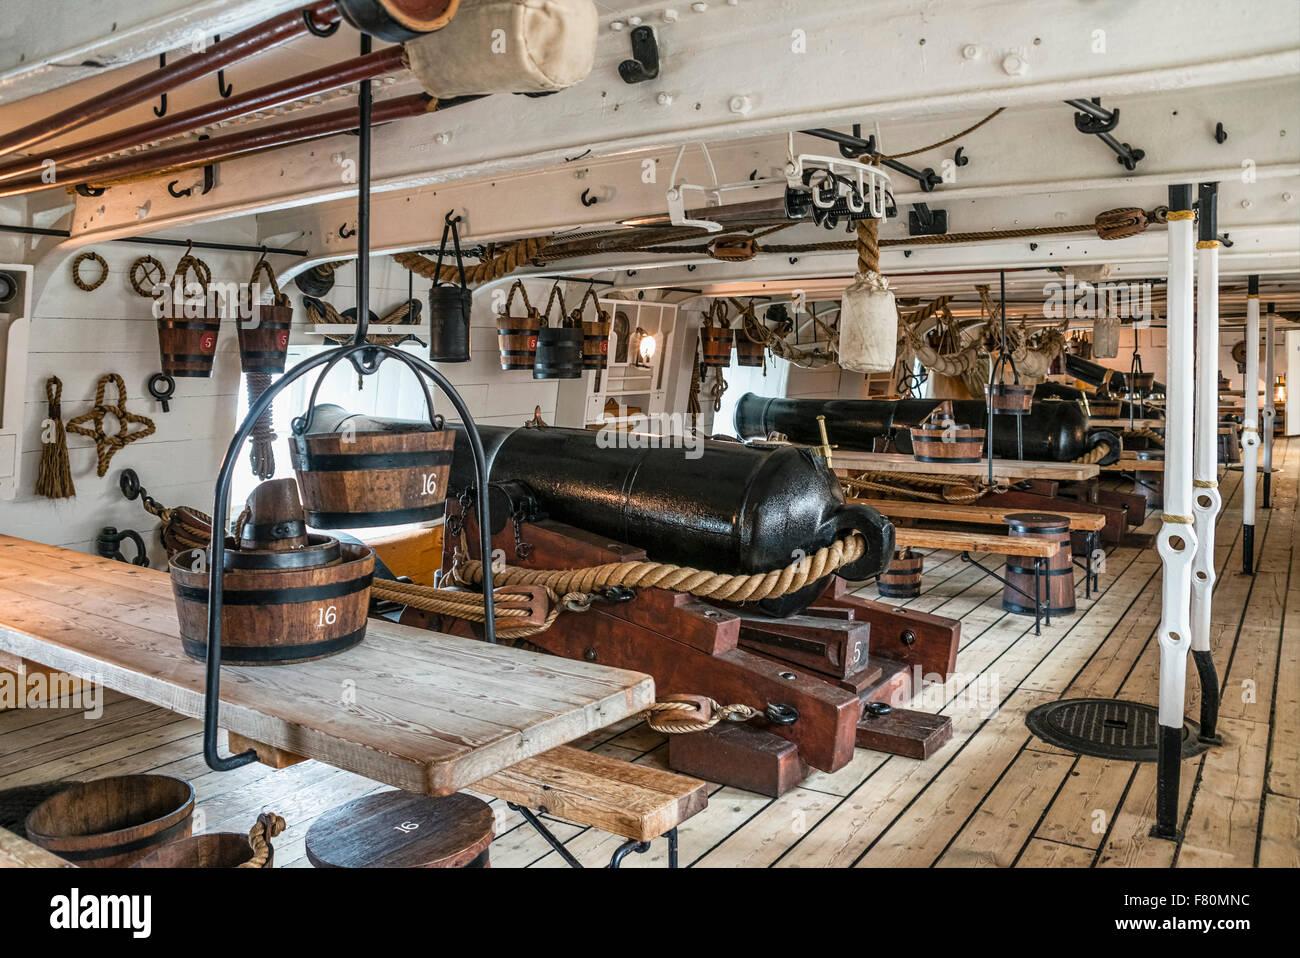 Lower gun deck of HMS Warrior at the Portsmouth Historic Dockyard, England, UK. - Stock Image